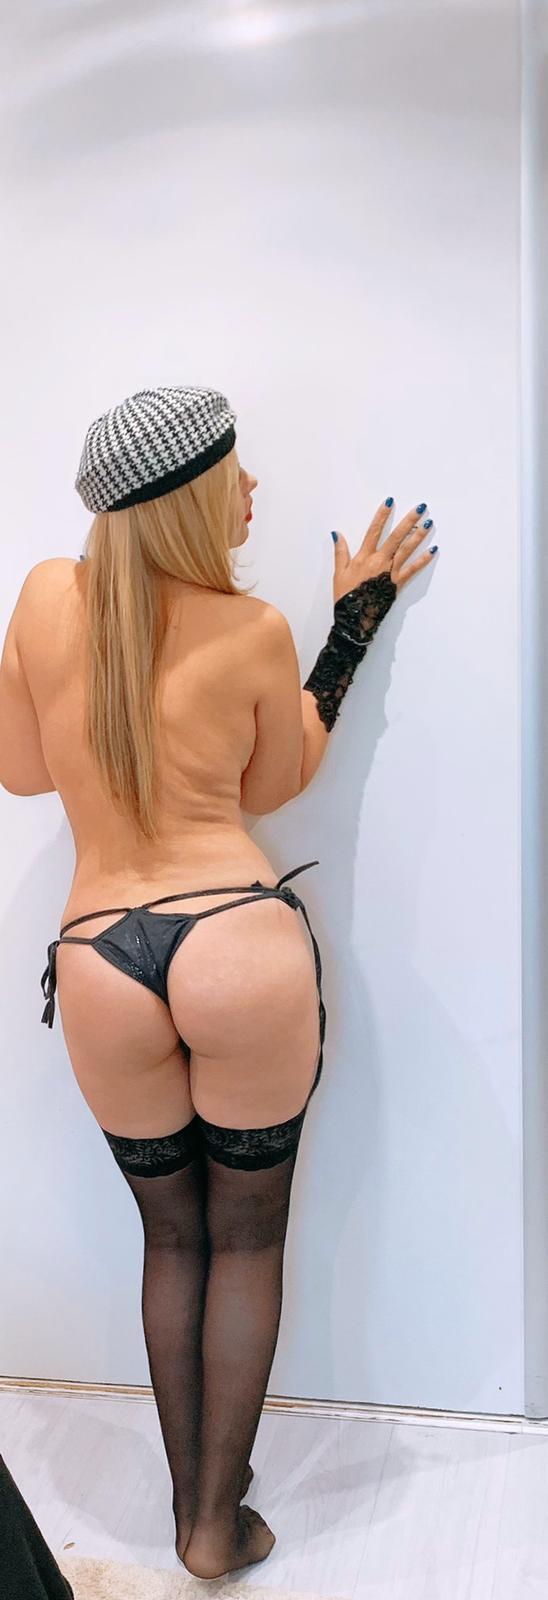 IZABEL CAXONDA Y VICIOSA 633715057